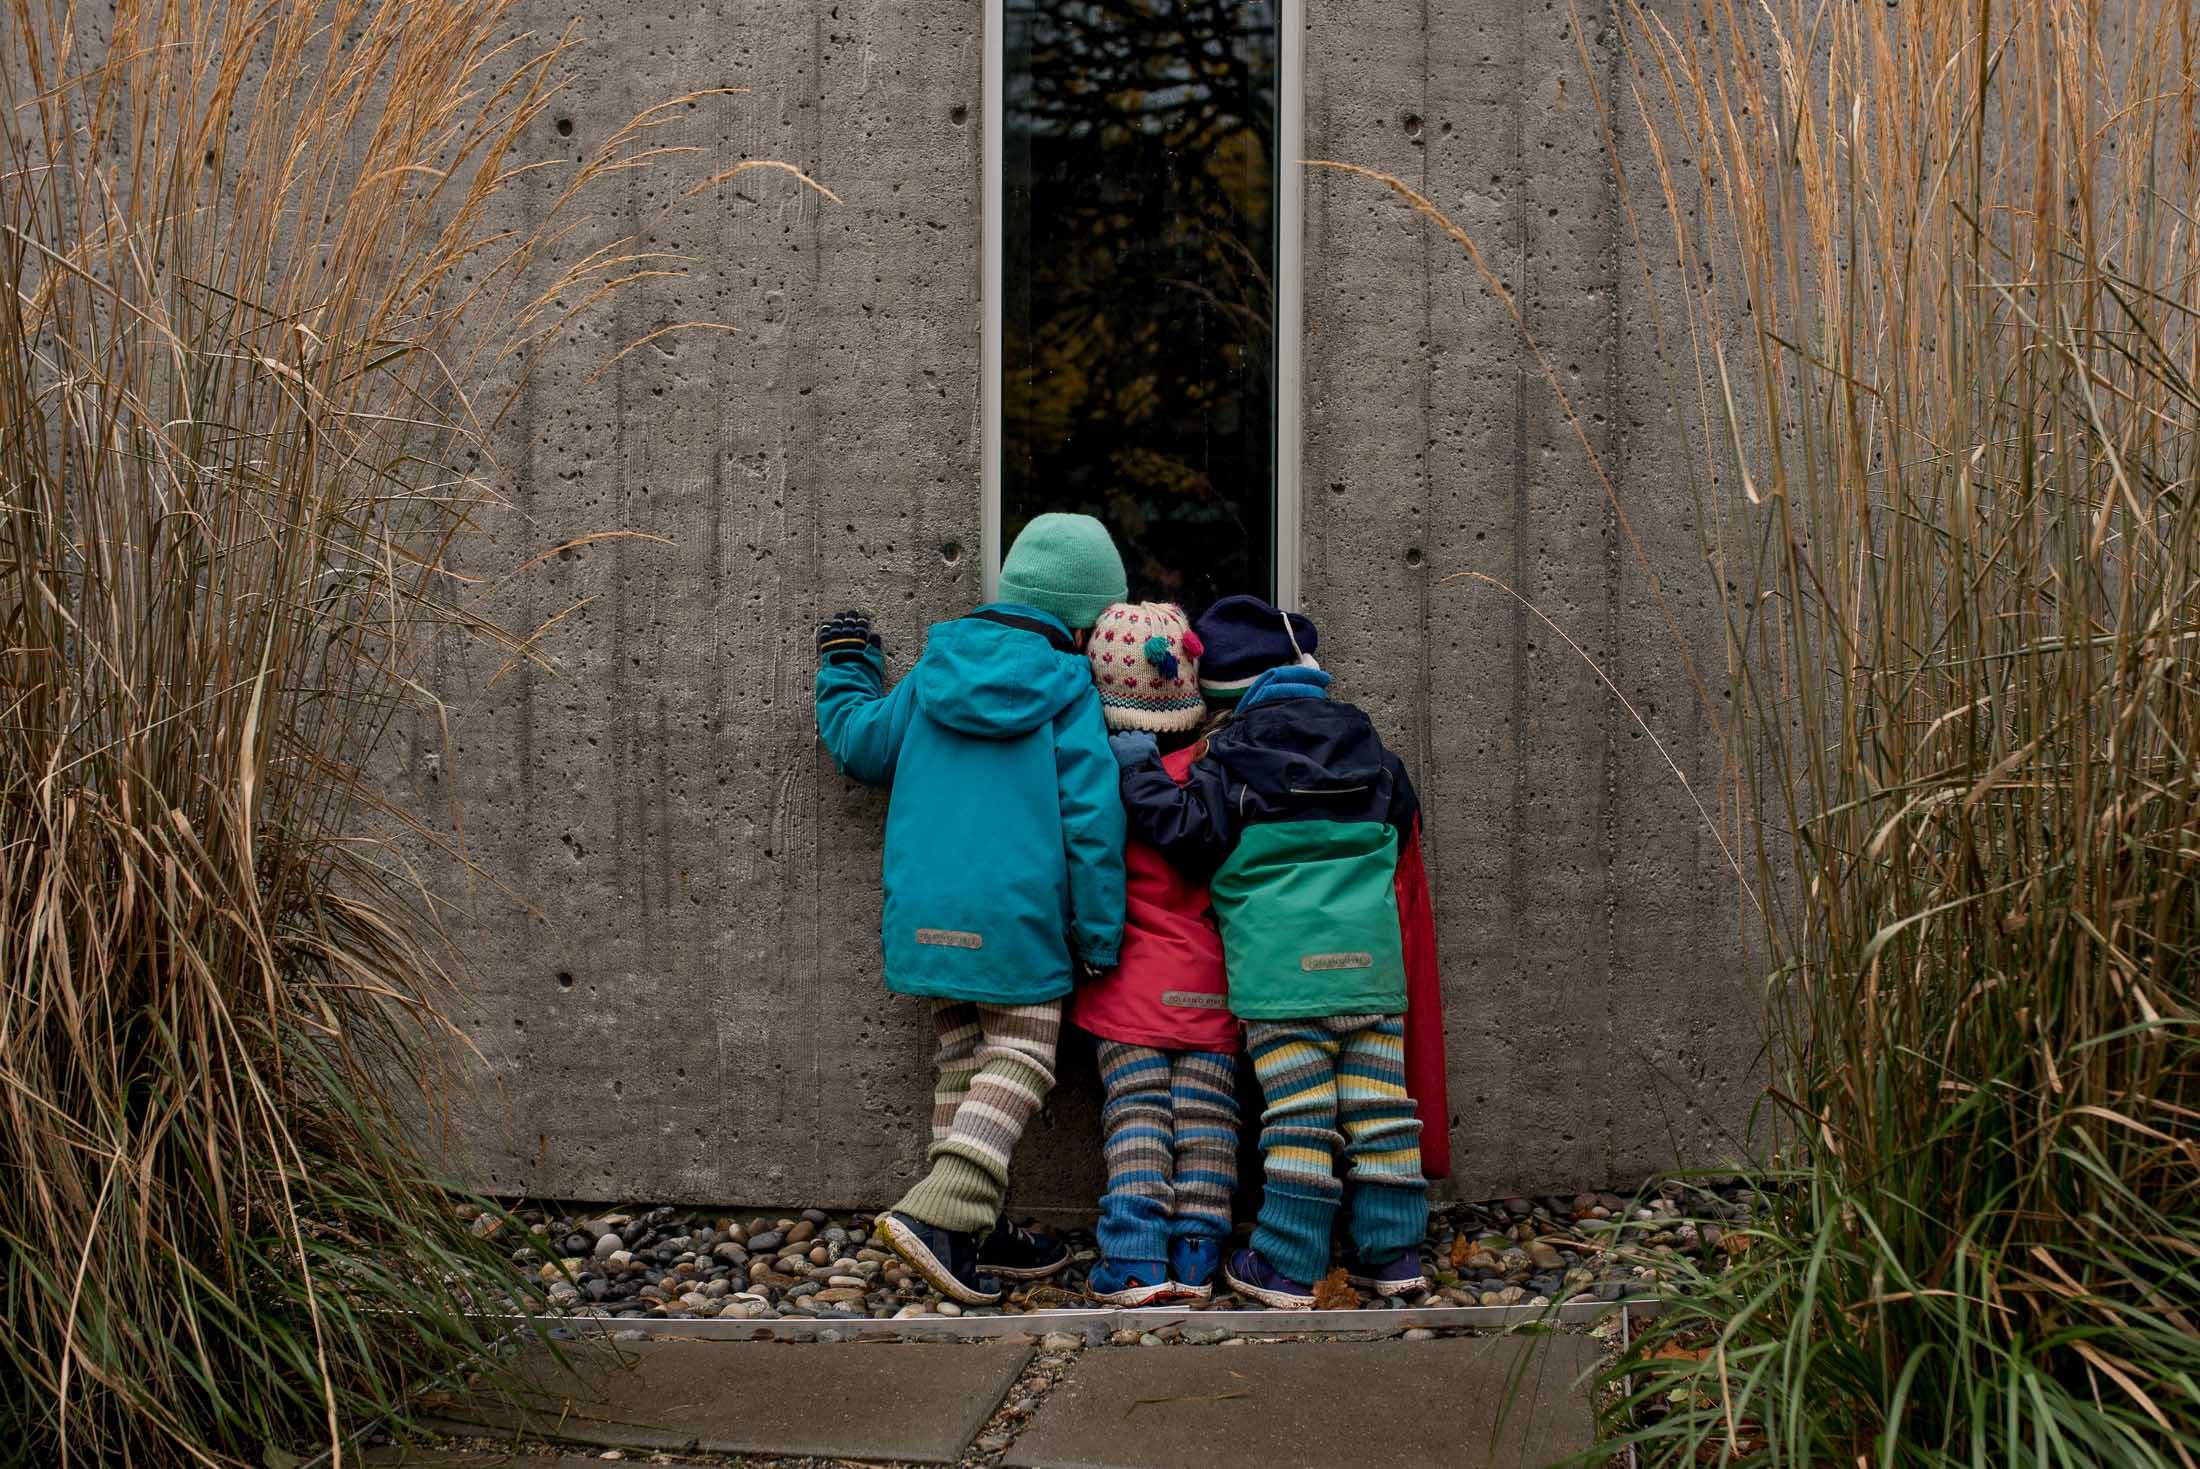 Photo: Kristine Nyborg / www.kristinenyborg.com